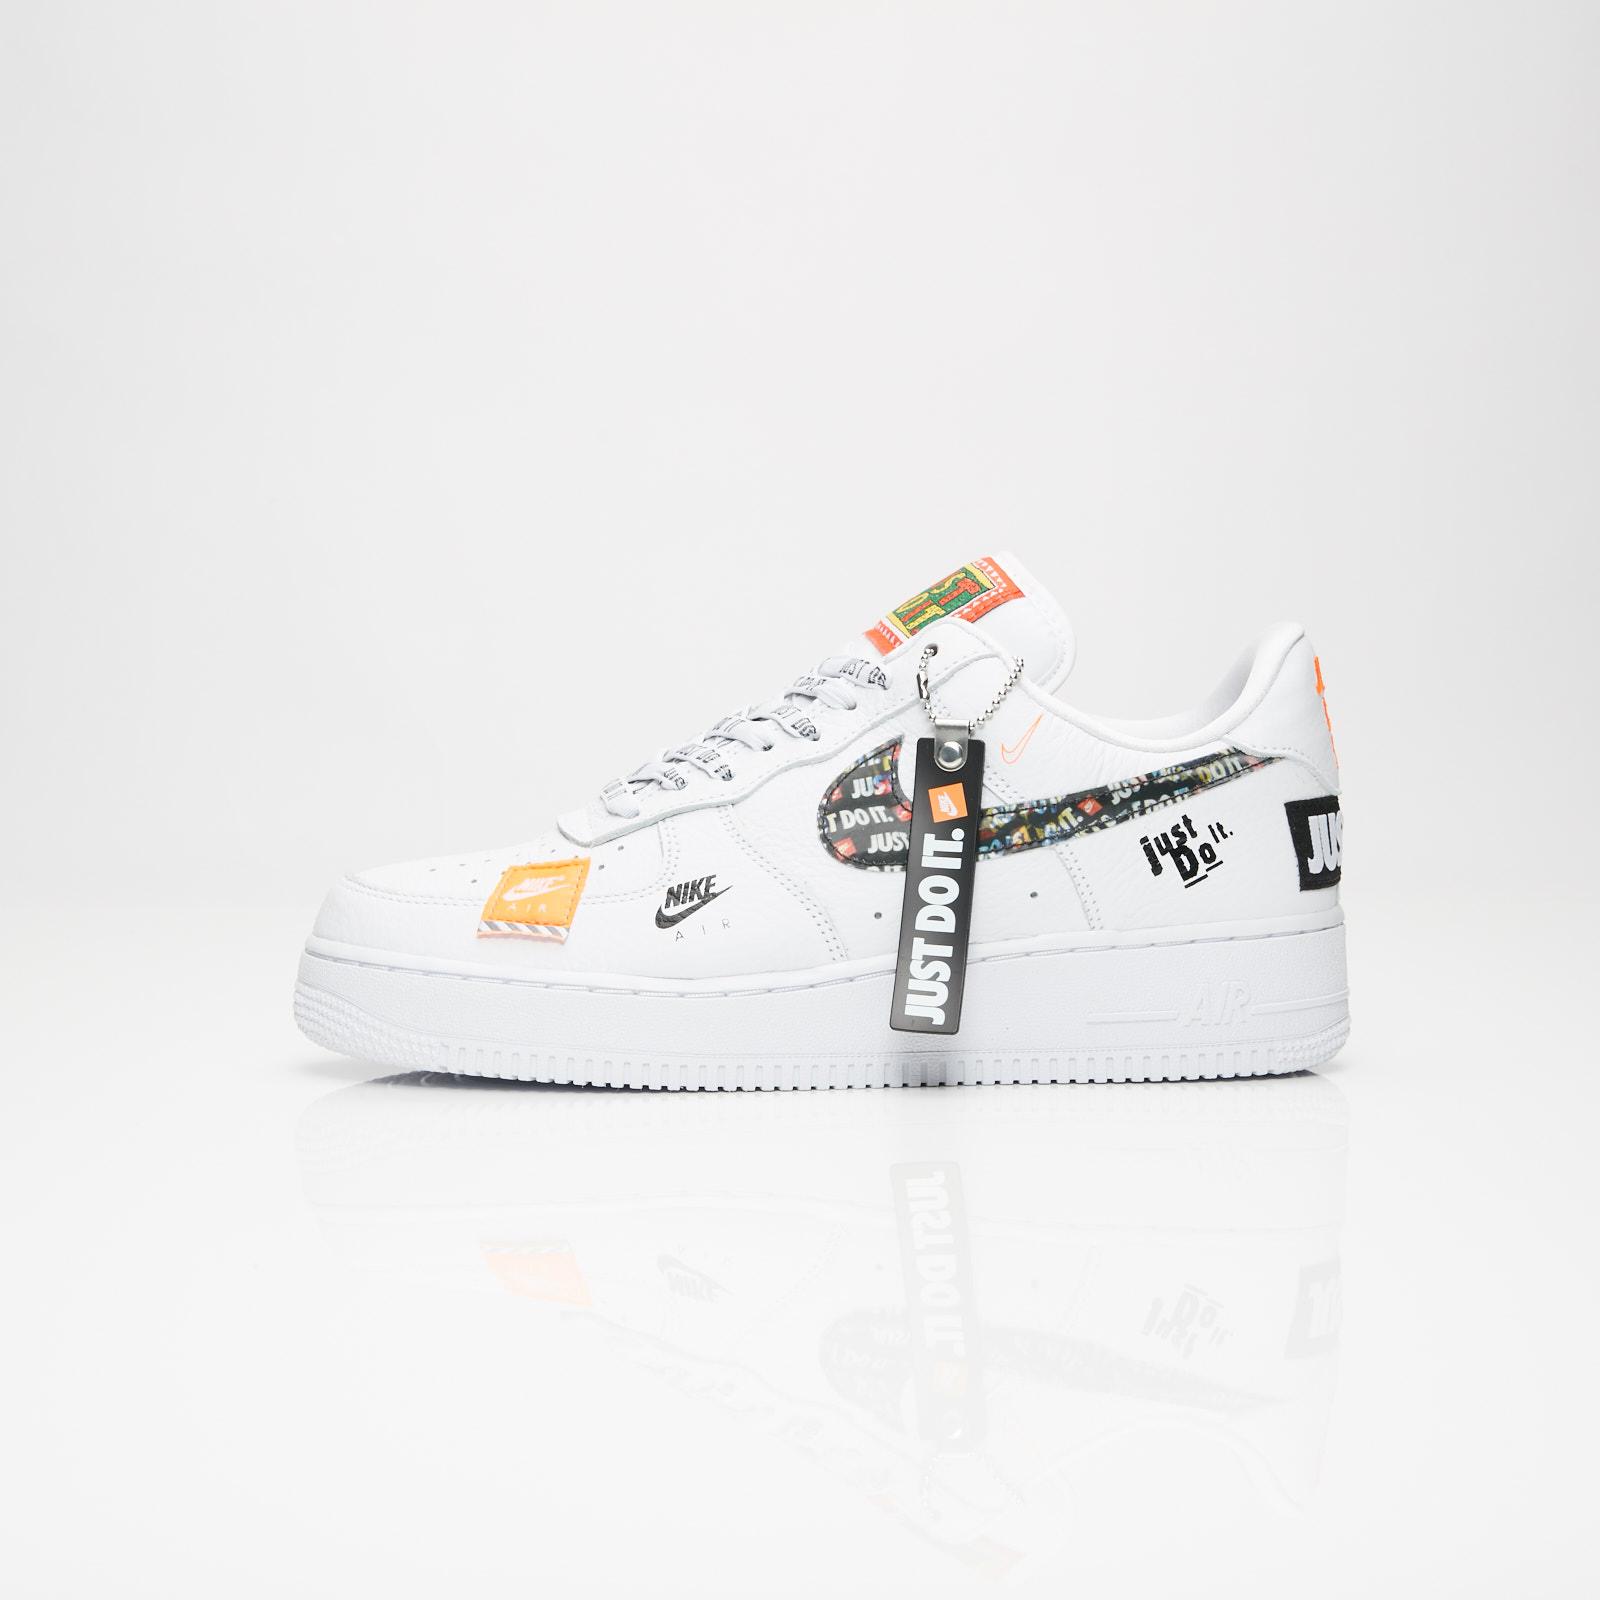 promo code 16a0b 9c4d7 Nike Air Force 1 07 Premium Just Do It - Ar7719-100 - Sneakersnstuff |  sneakers & streetwear online since 1999